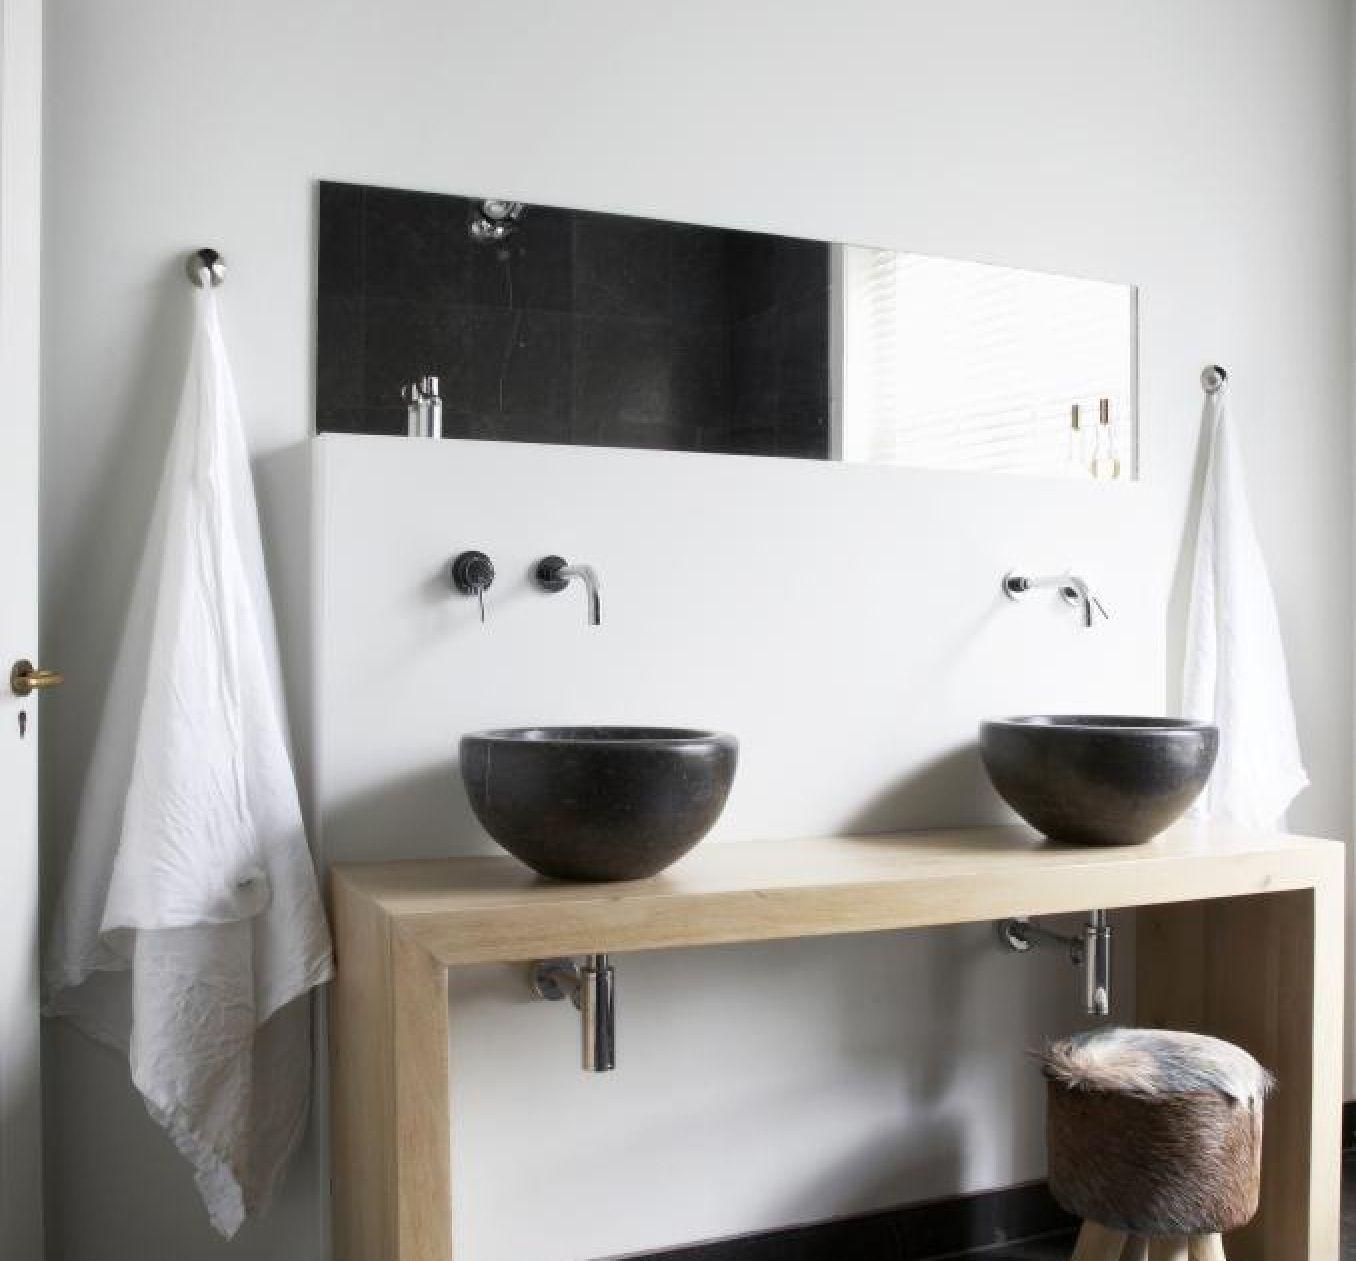 Reforma ba o con lavabos dise o negros sobre encimera de - Grifos de pared ...